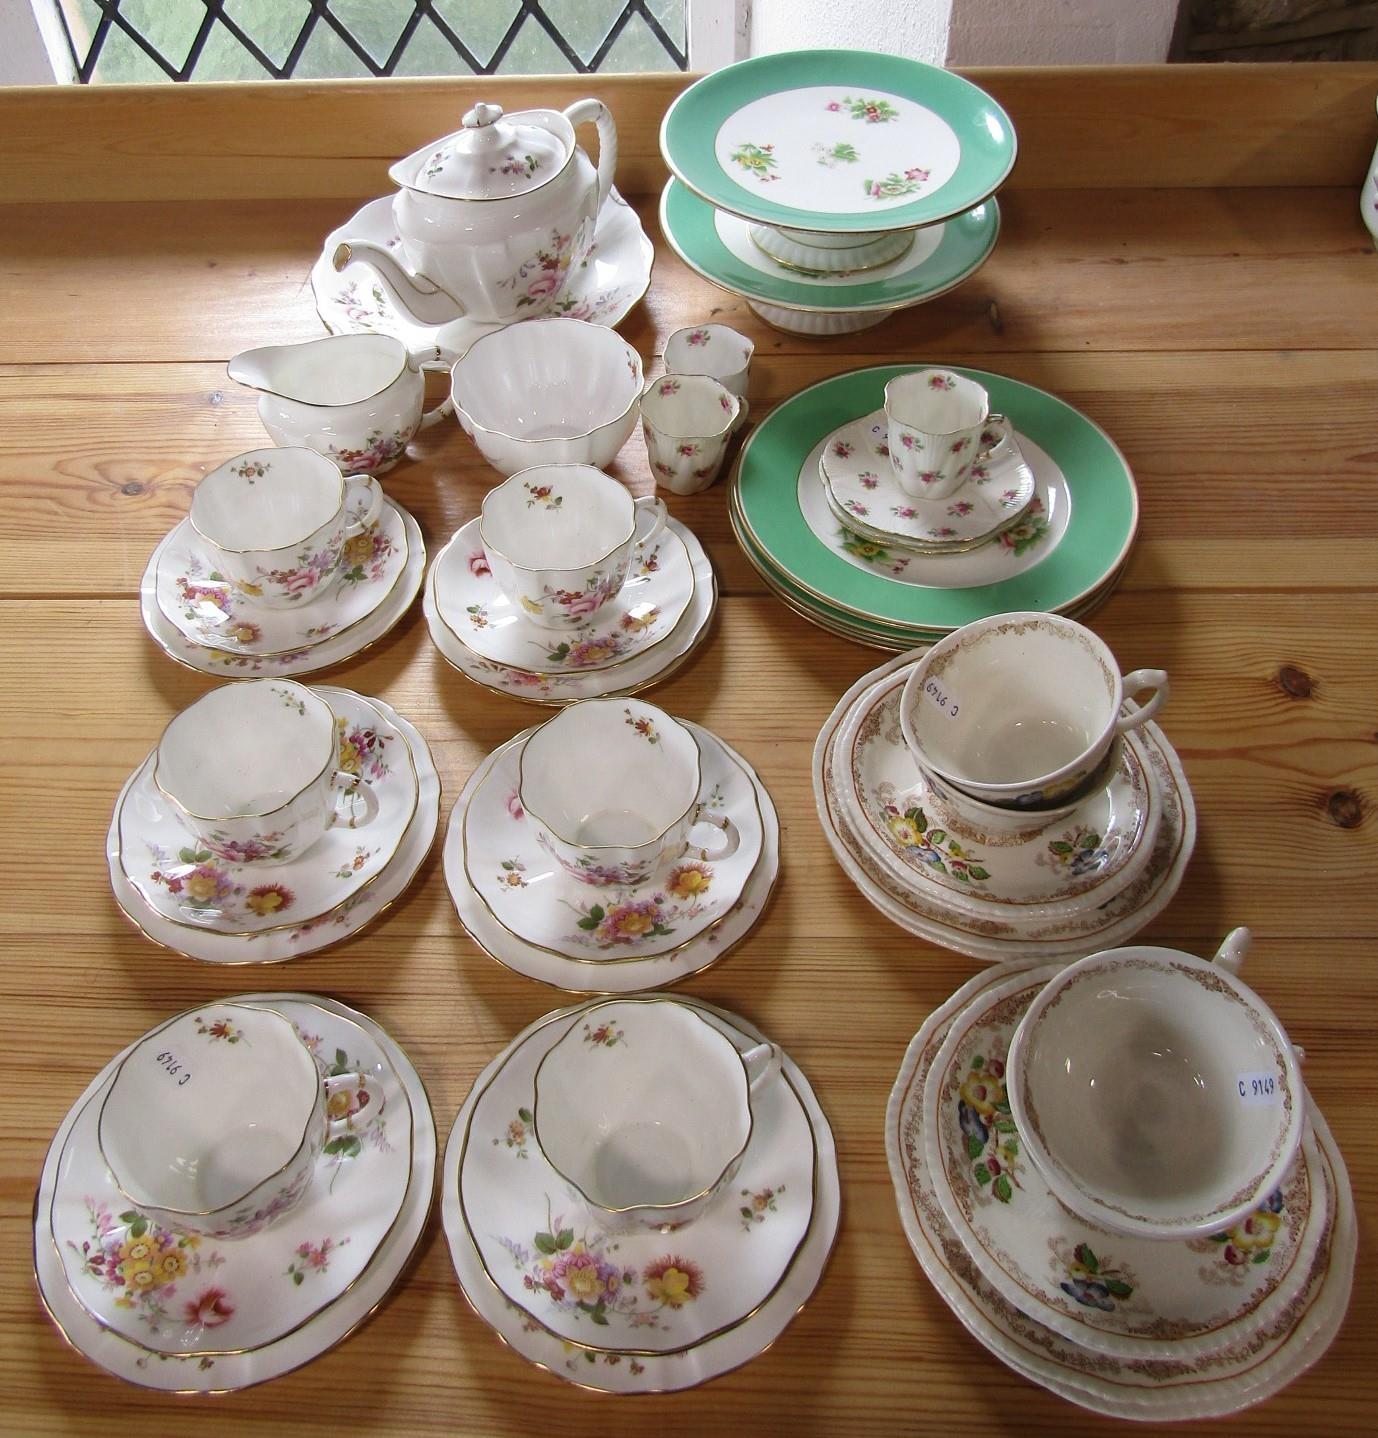 A collection of Royal Crown Derby - Derby Posies pattern tea wares comprising teapot, milk jug, - Bild 2 aus 2